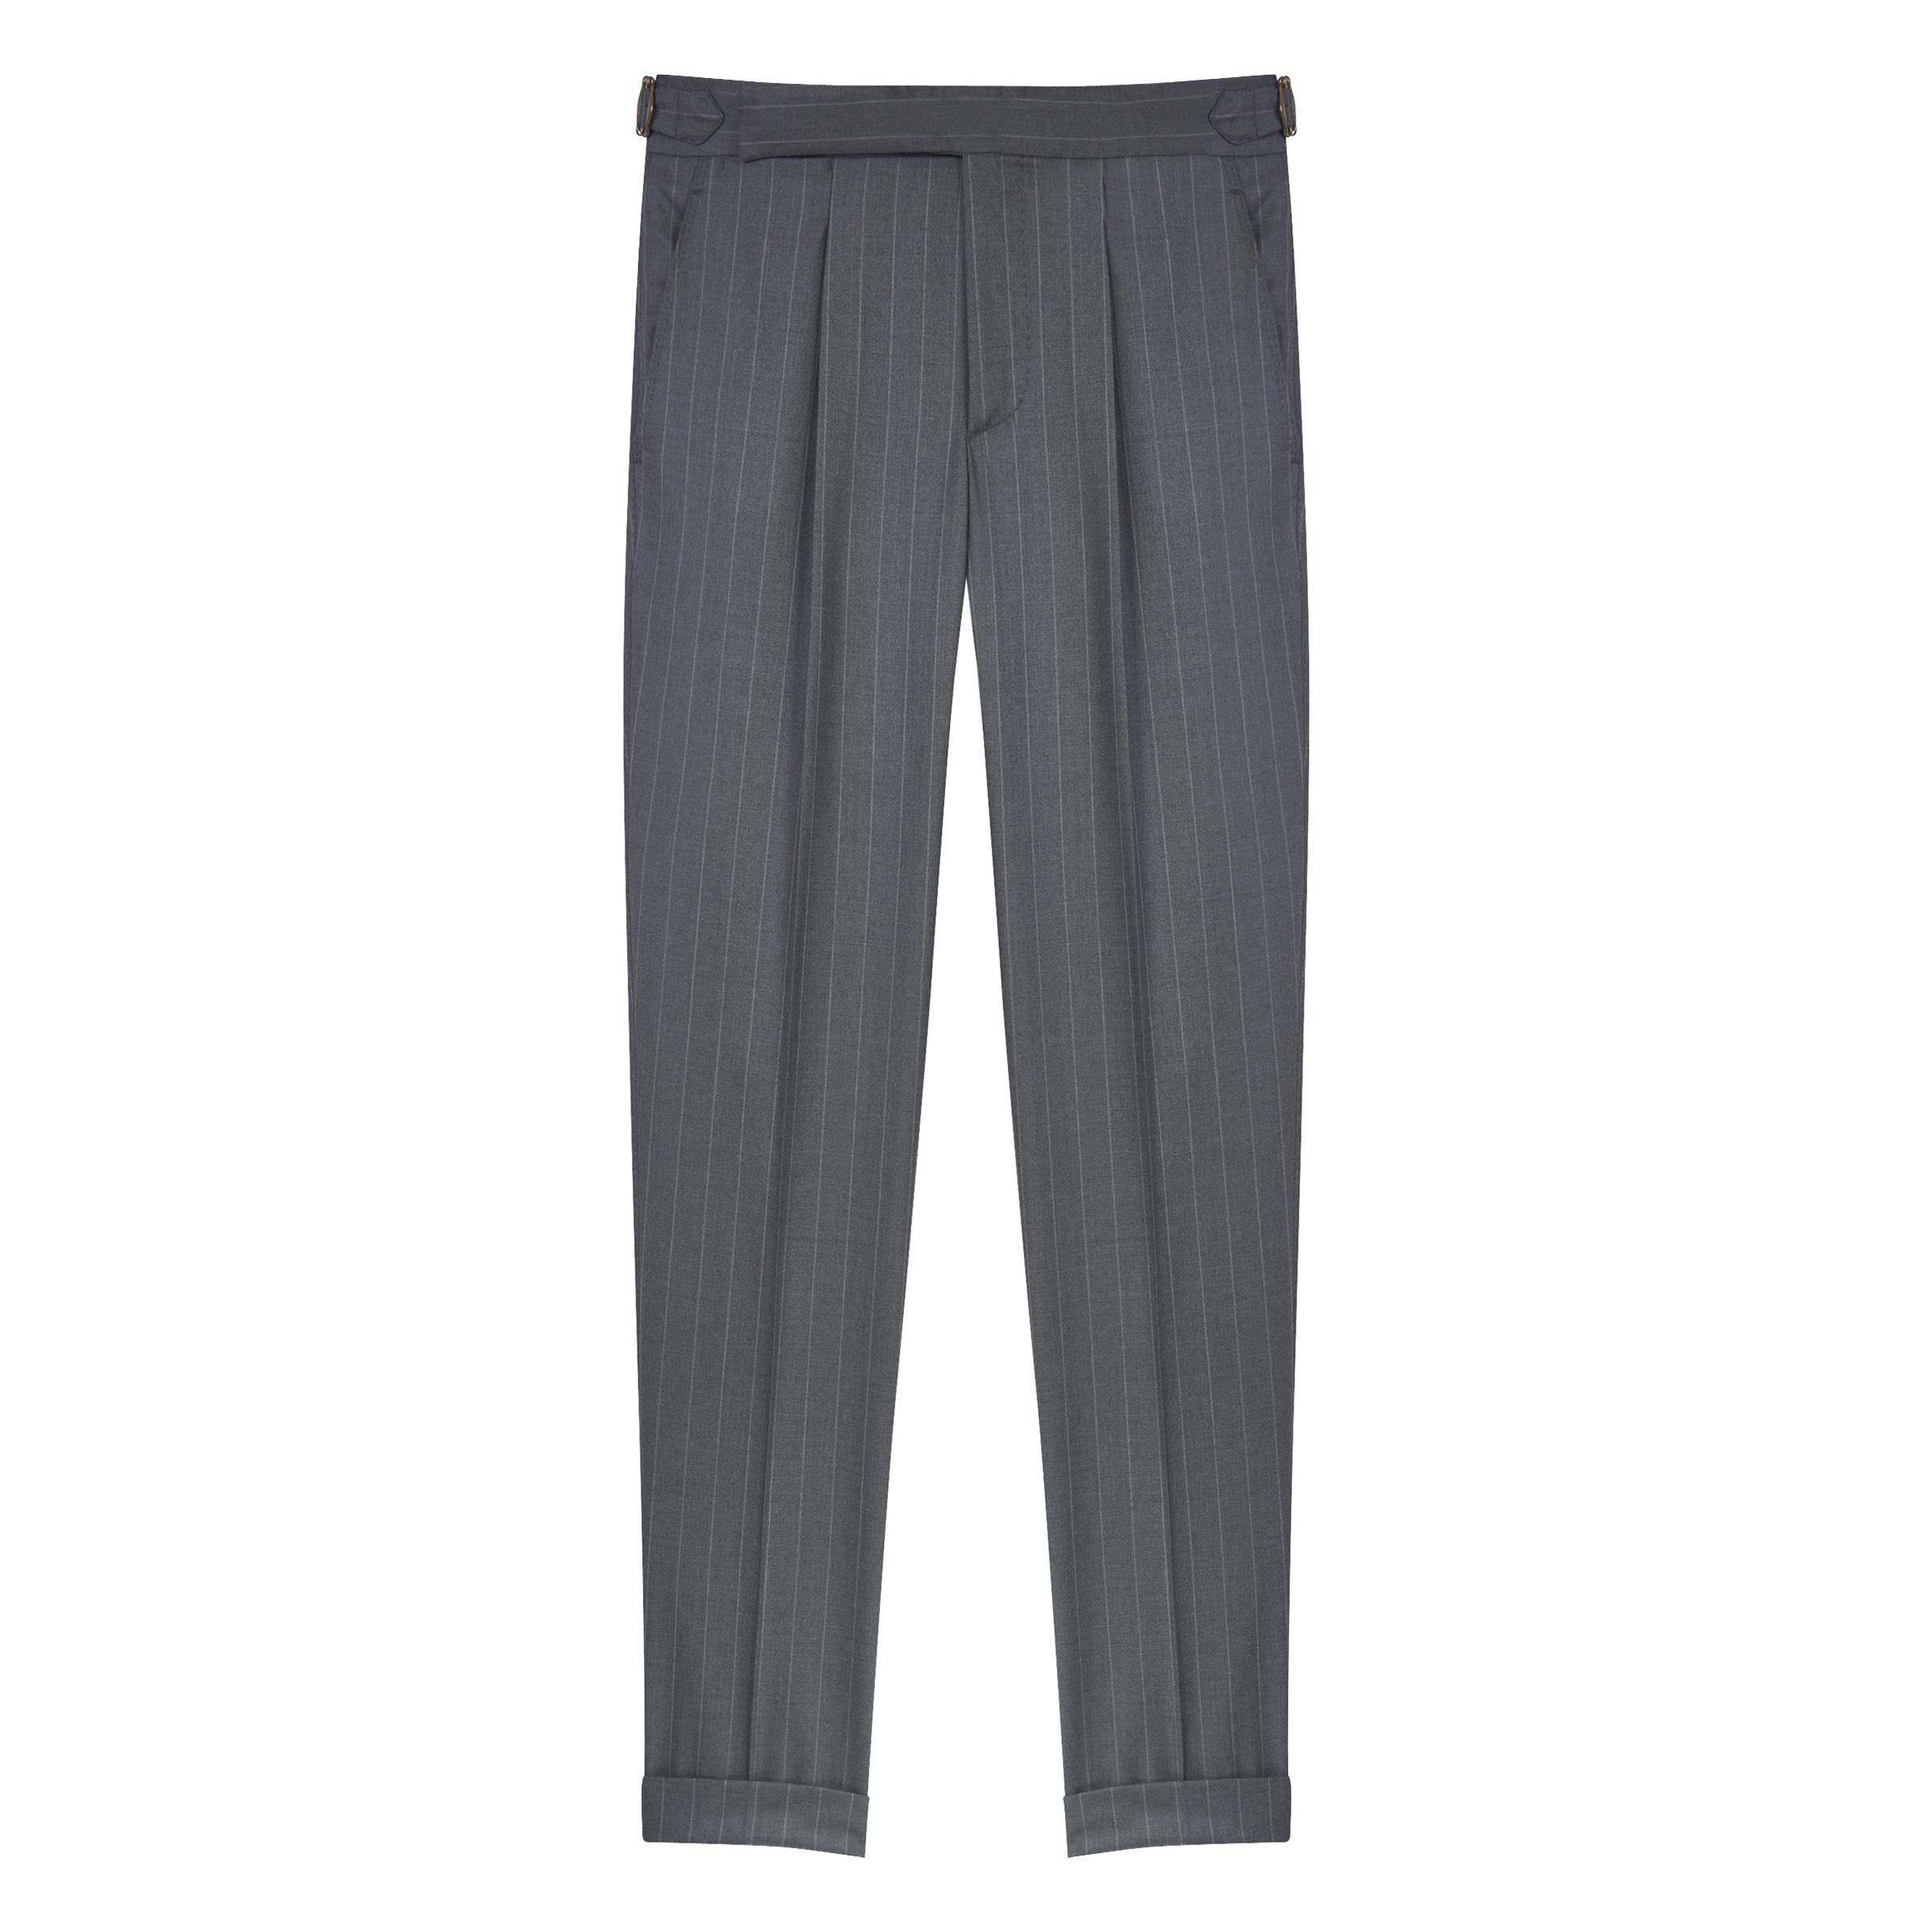 Grey Wool Pinstripe Super 170's Trousers